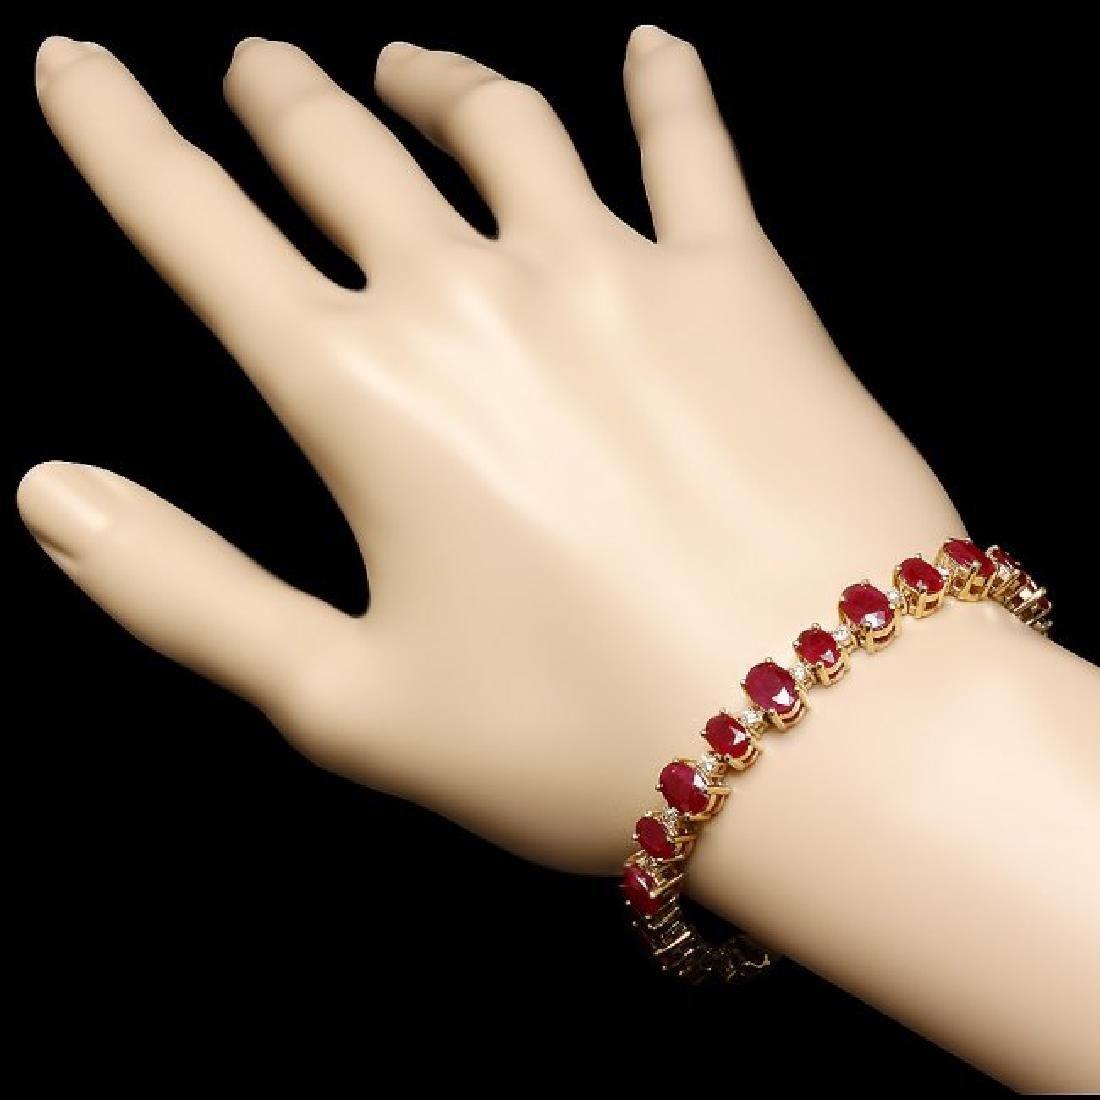 14k Gold 21.00ct Ruby 0.90ct Diamond Bracelet - 3